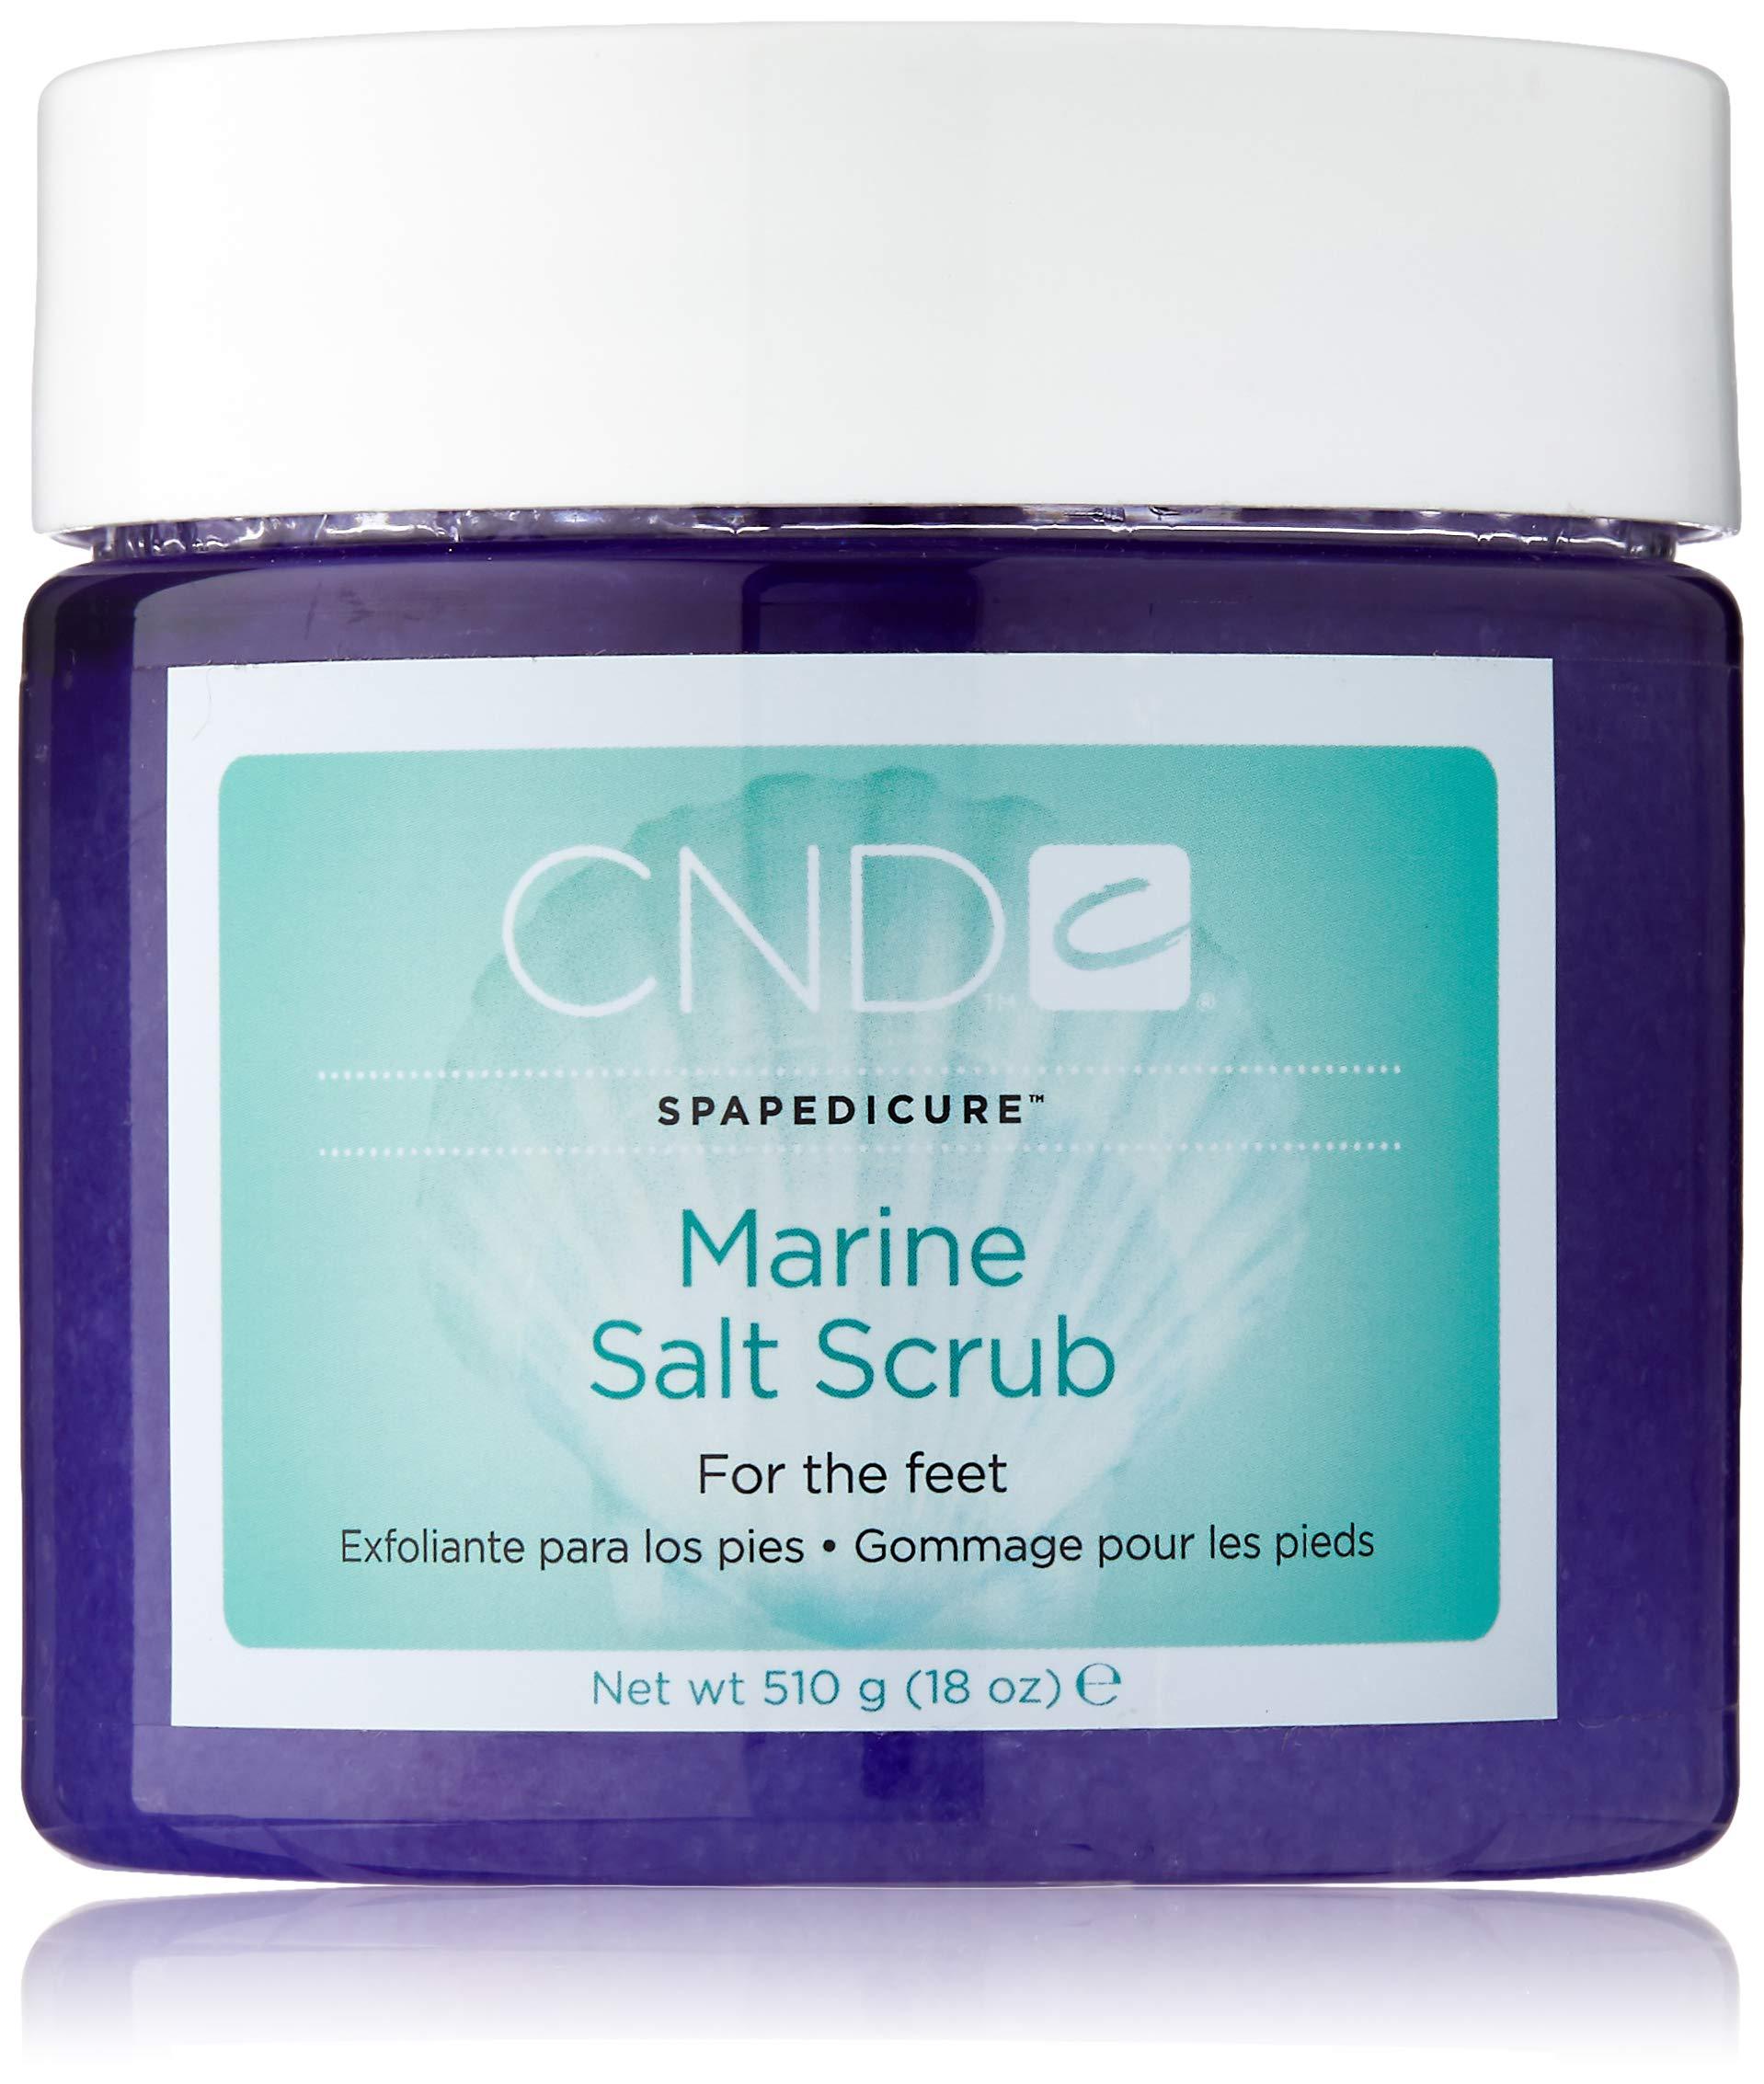 SpaPedicure Marine Salt Scrub 18 oz.